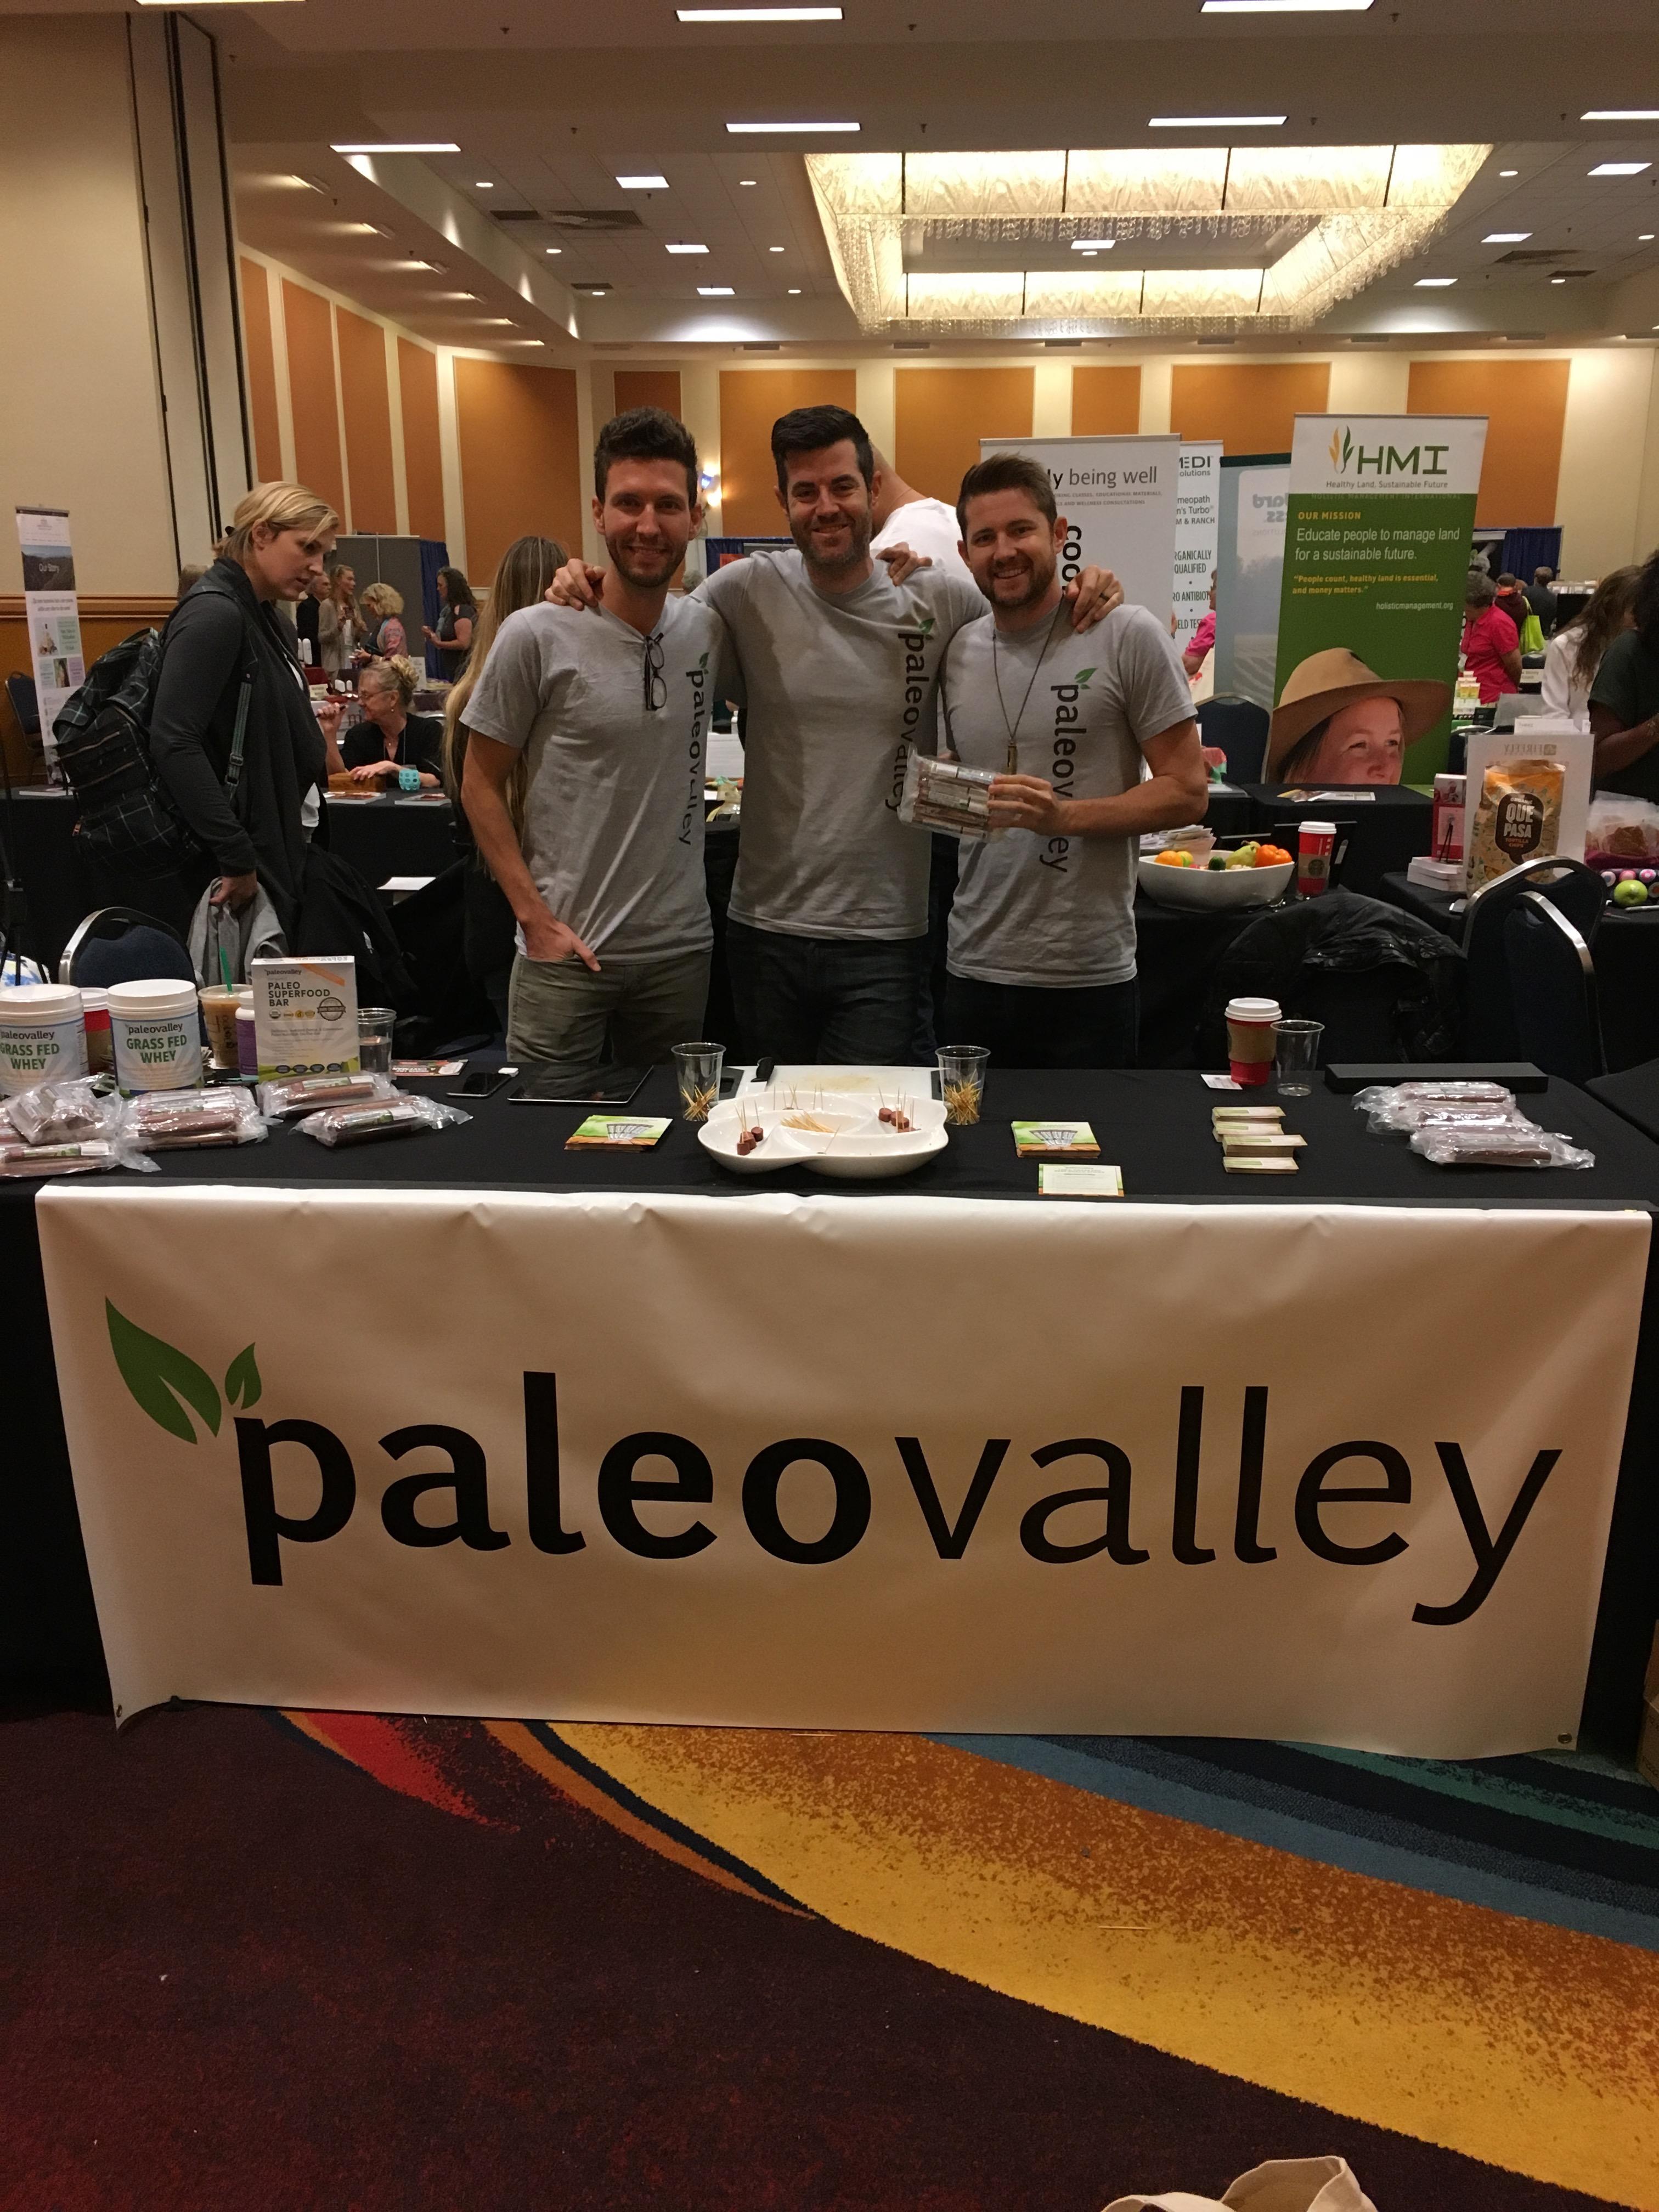 Paleo Valley